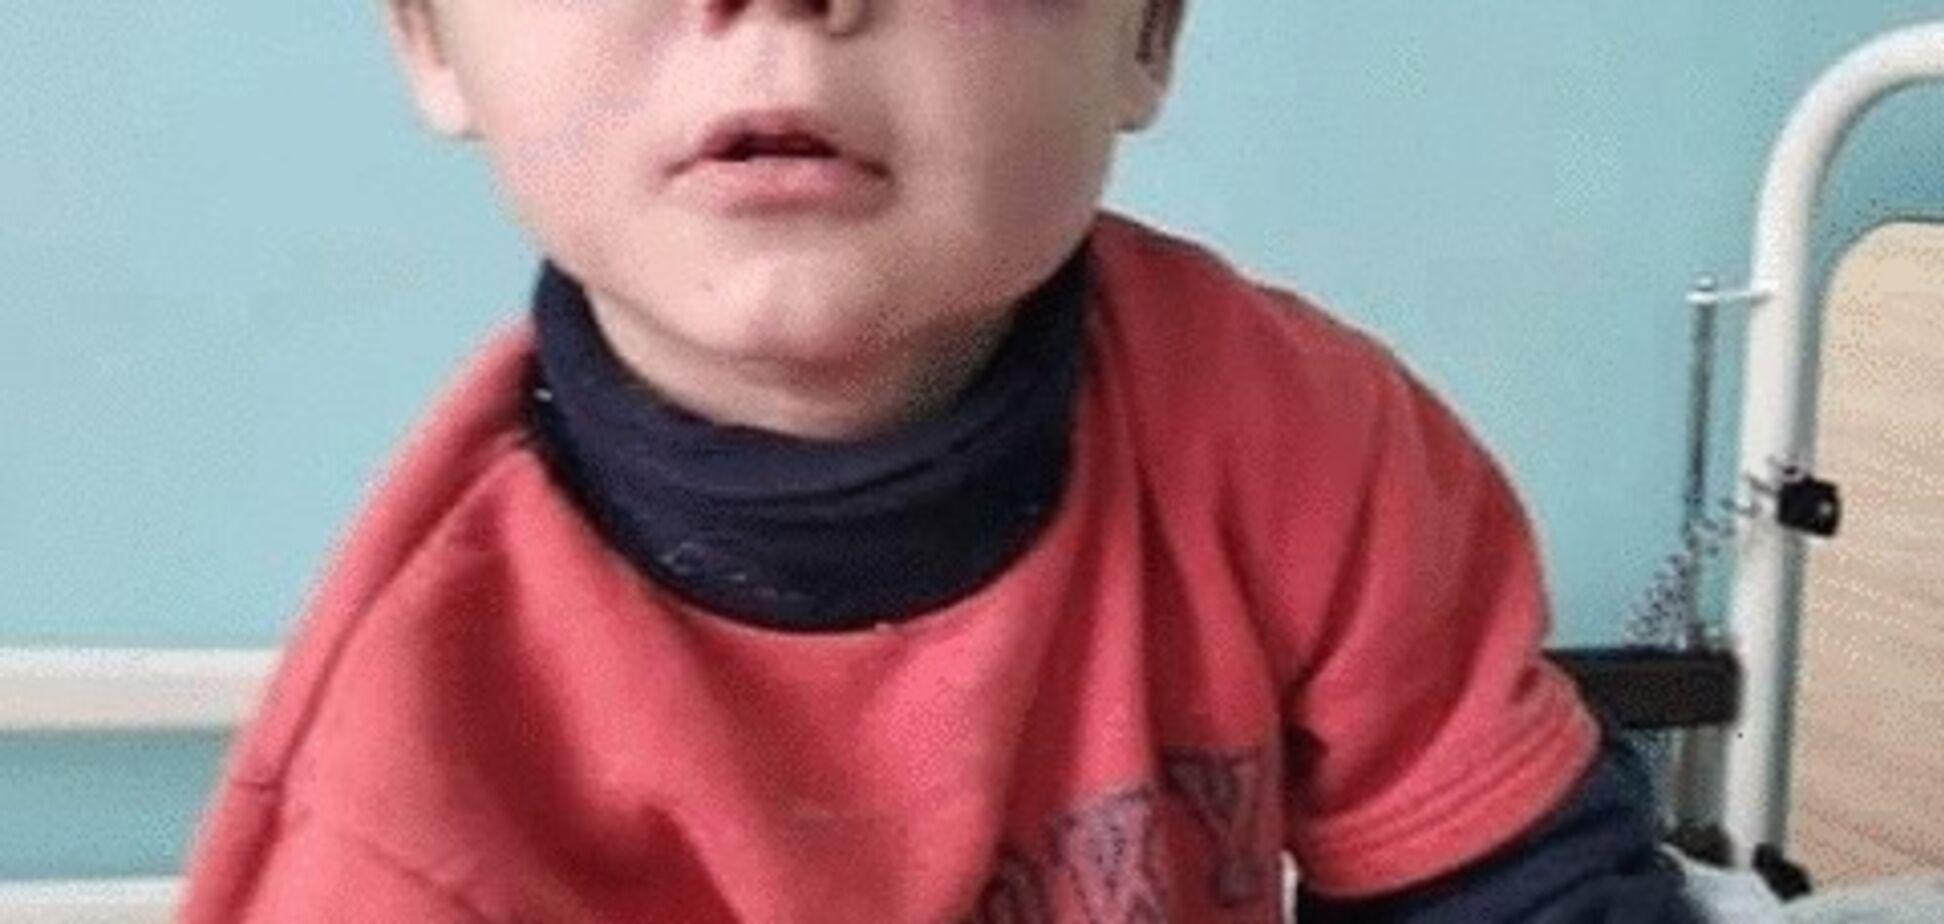 За синяками не видно глаз: на Винничине нашли жестоко избитого маленького ребенка. Фото 18+